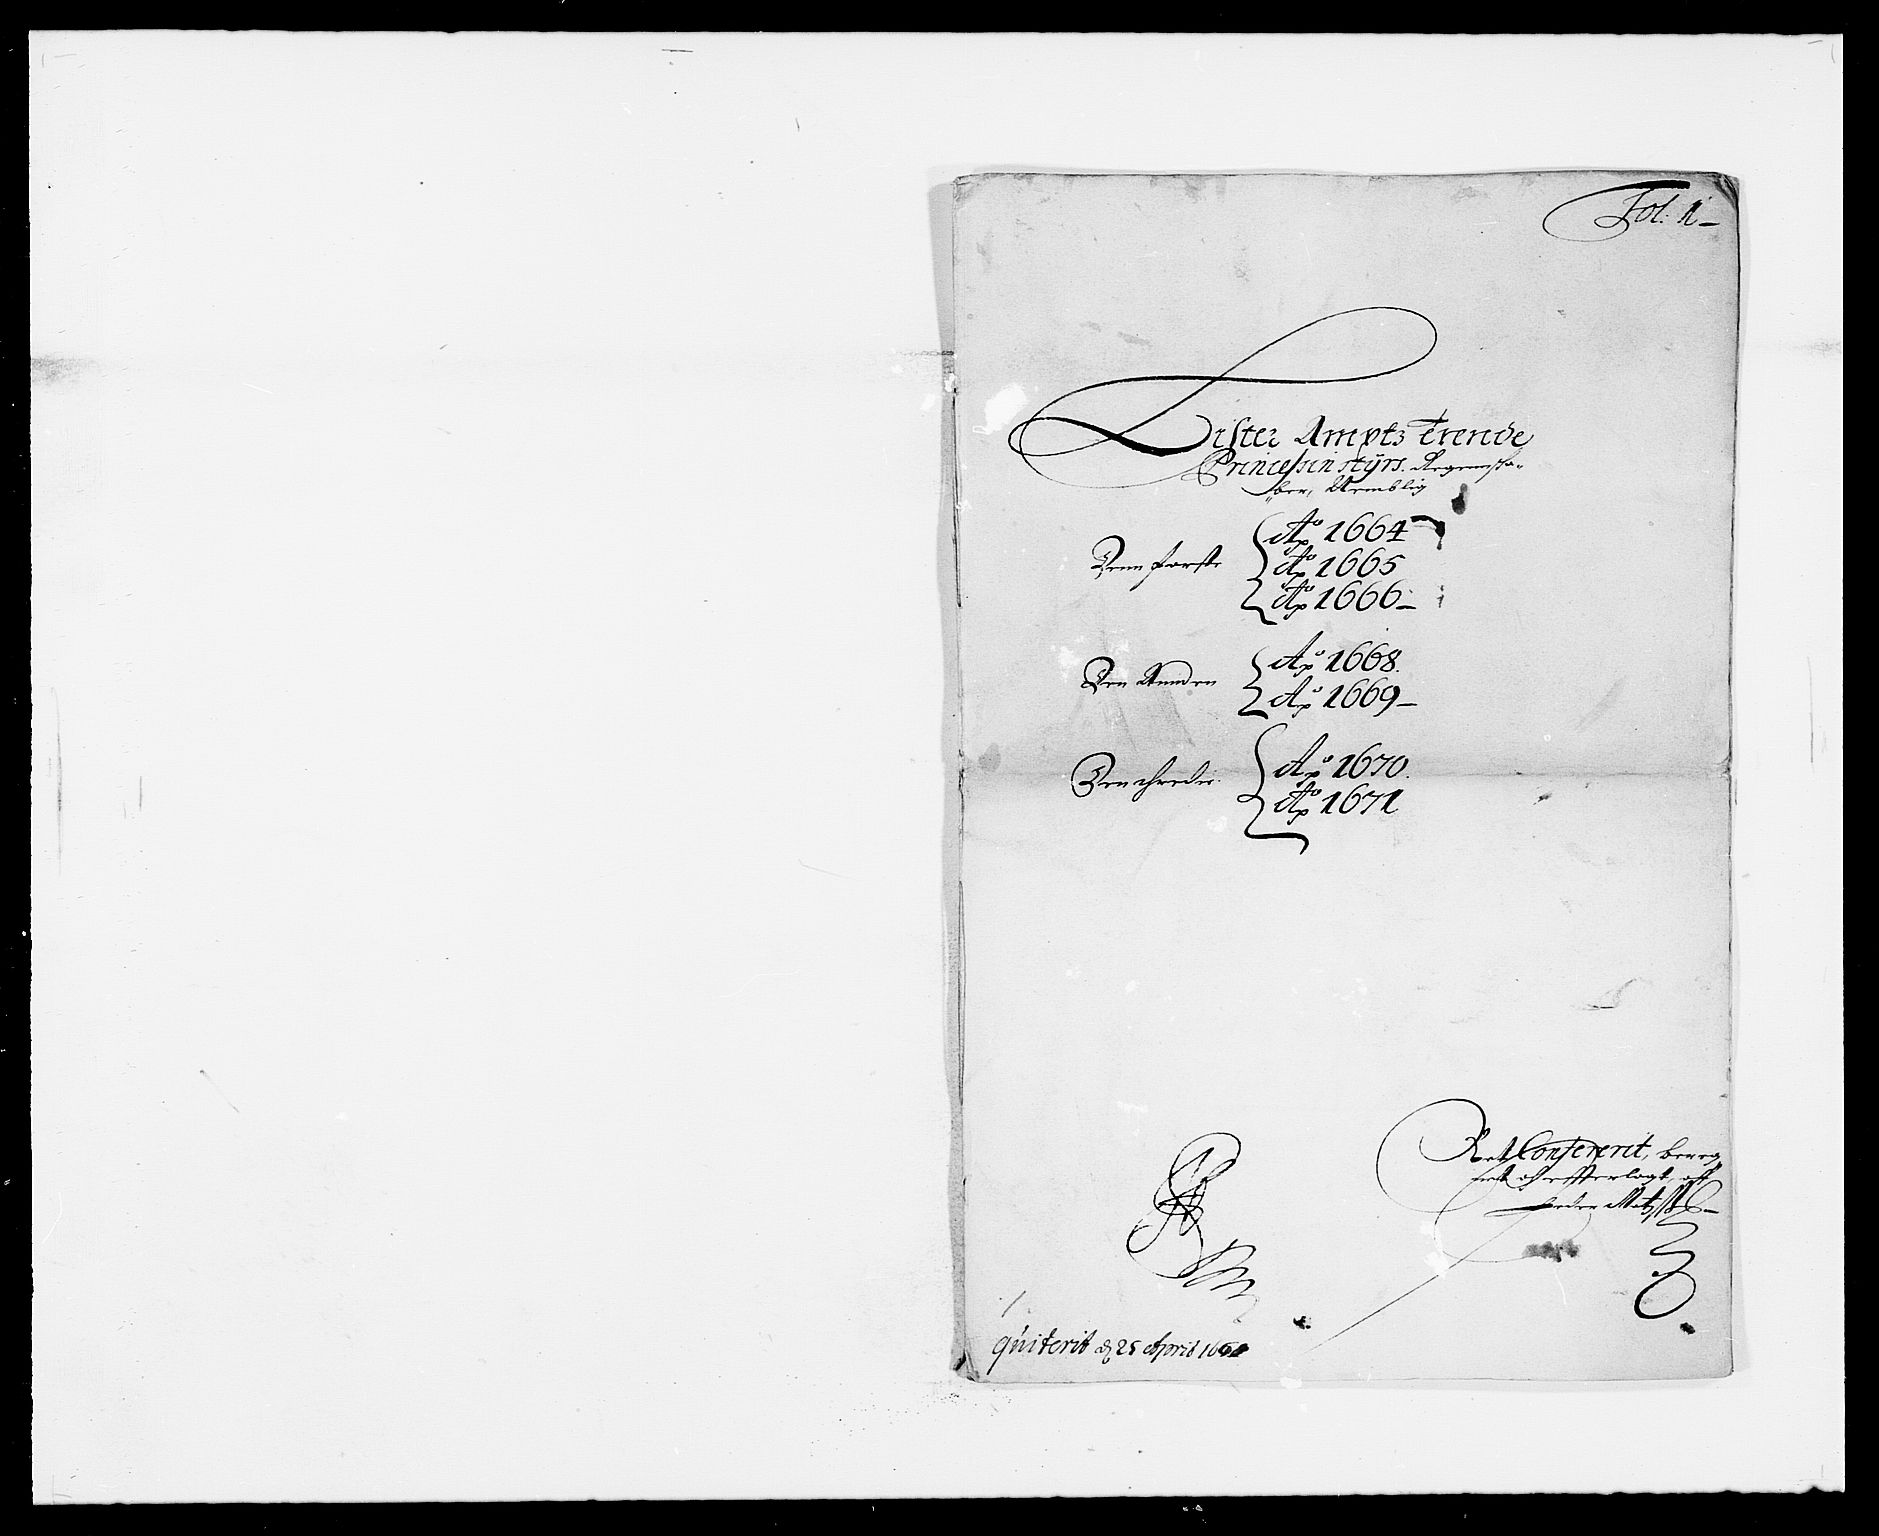 RA, Rentekammeret inntil 1814, Reviderte regnskaper, Fogderegnskap, R41/L2526: Fogderegnskap Lista, 1672, s. 155